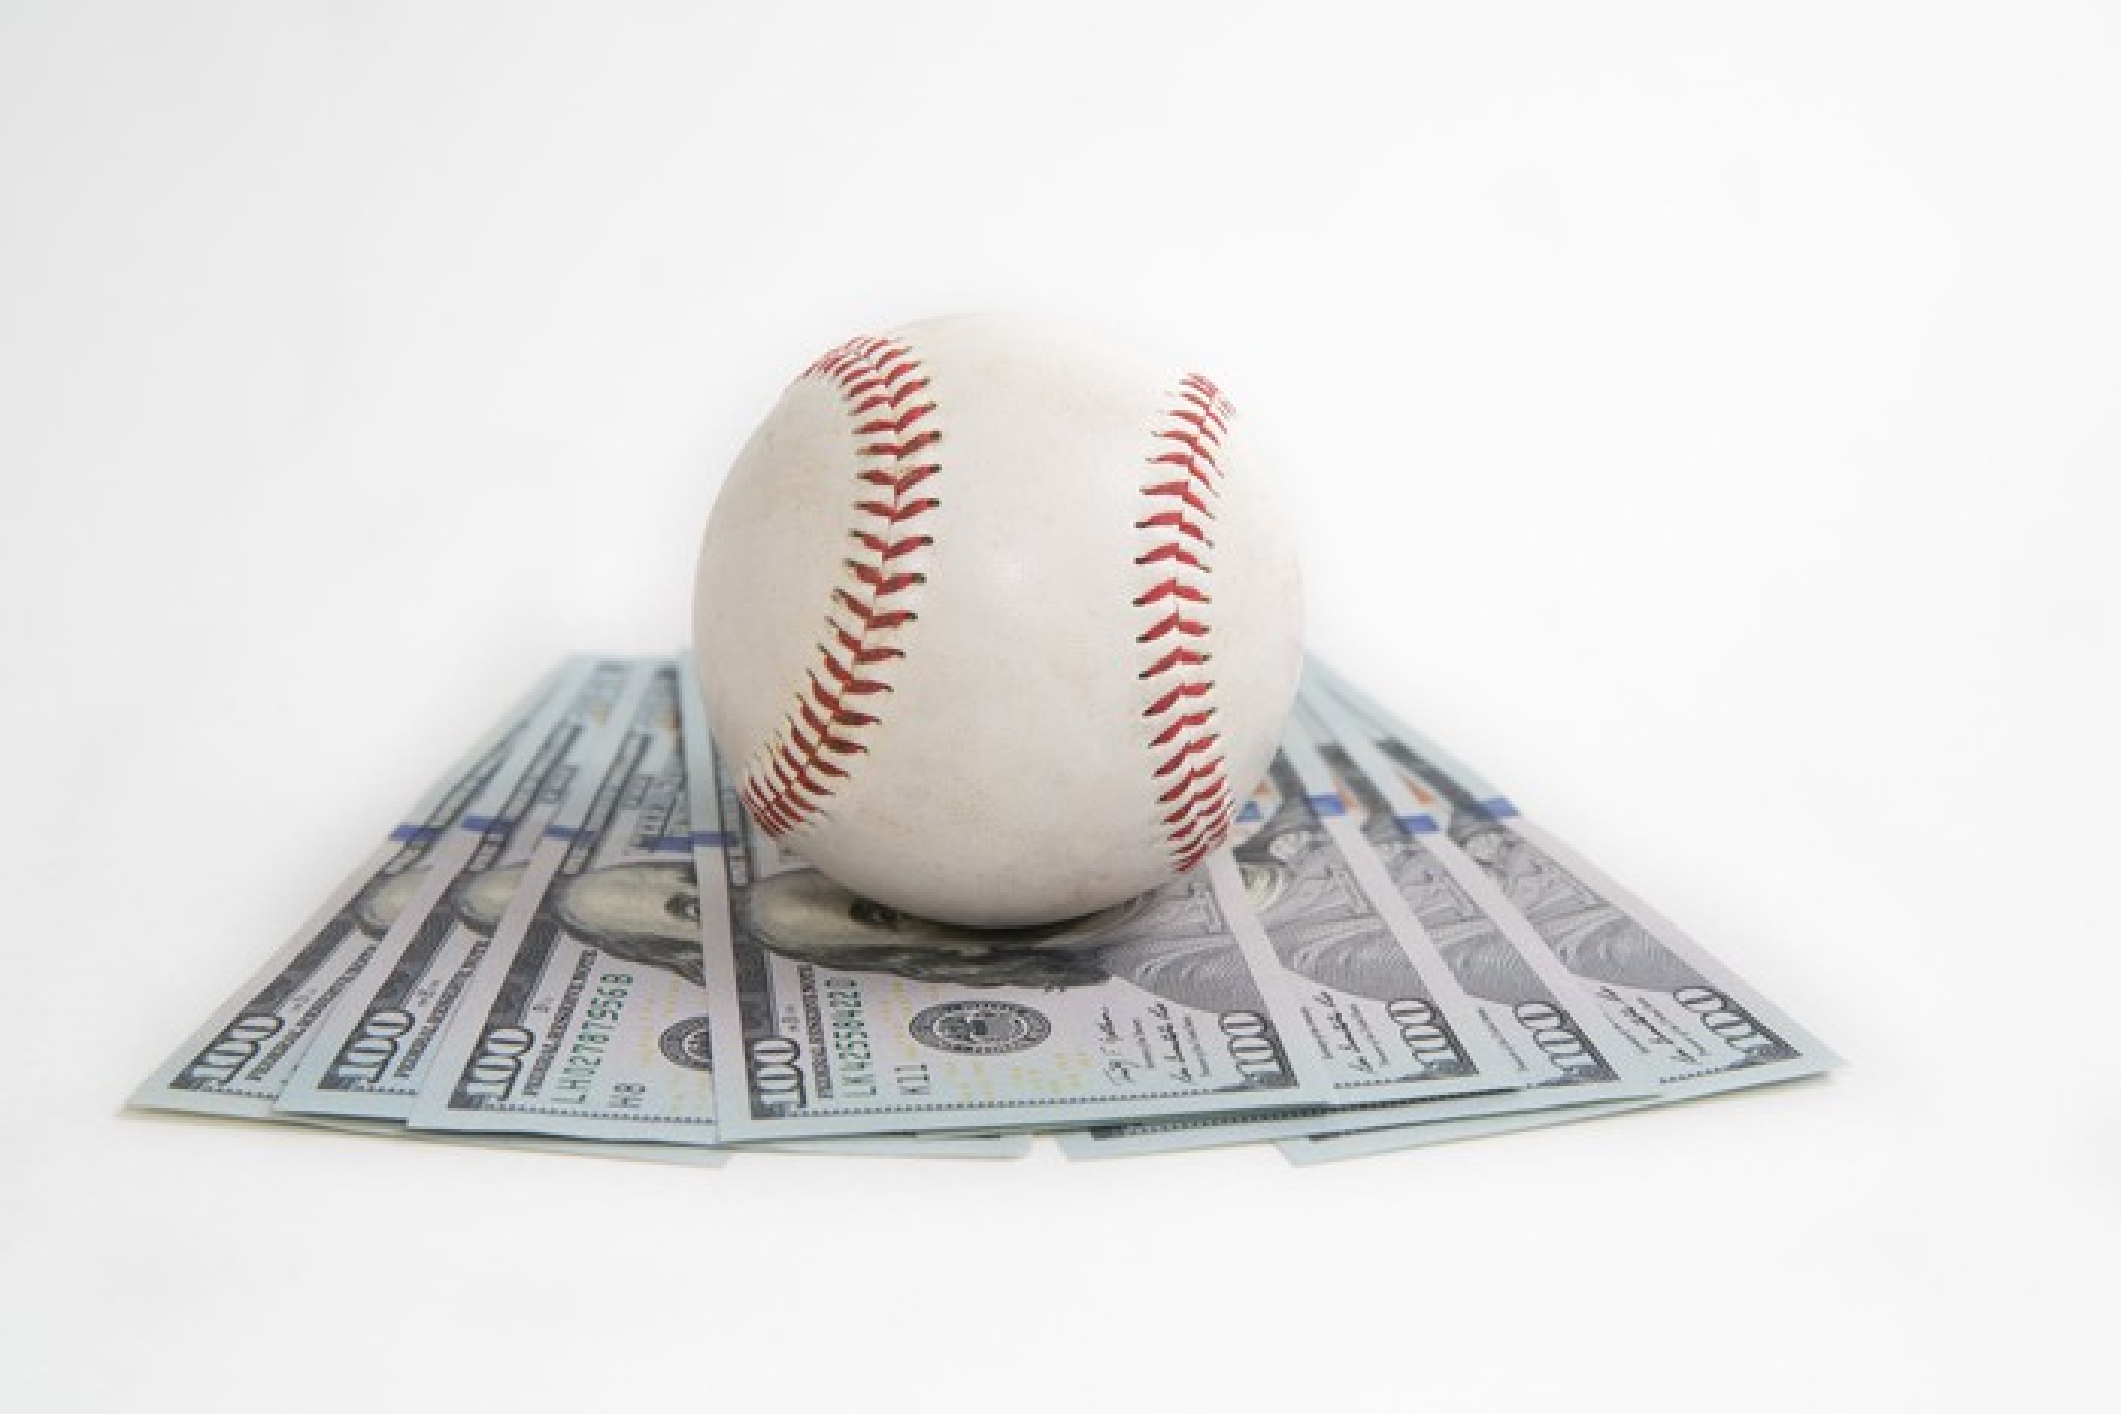 Baseball on top of $100 bills